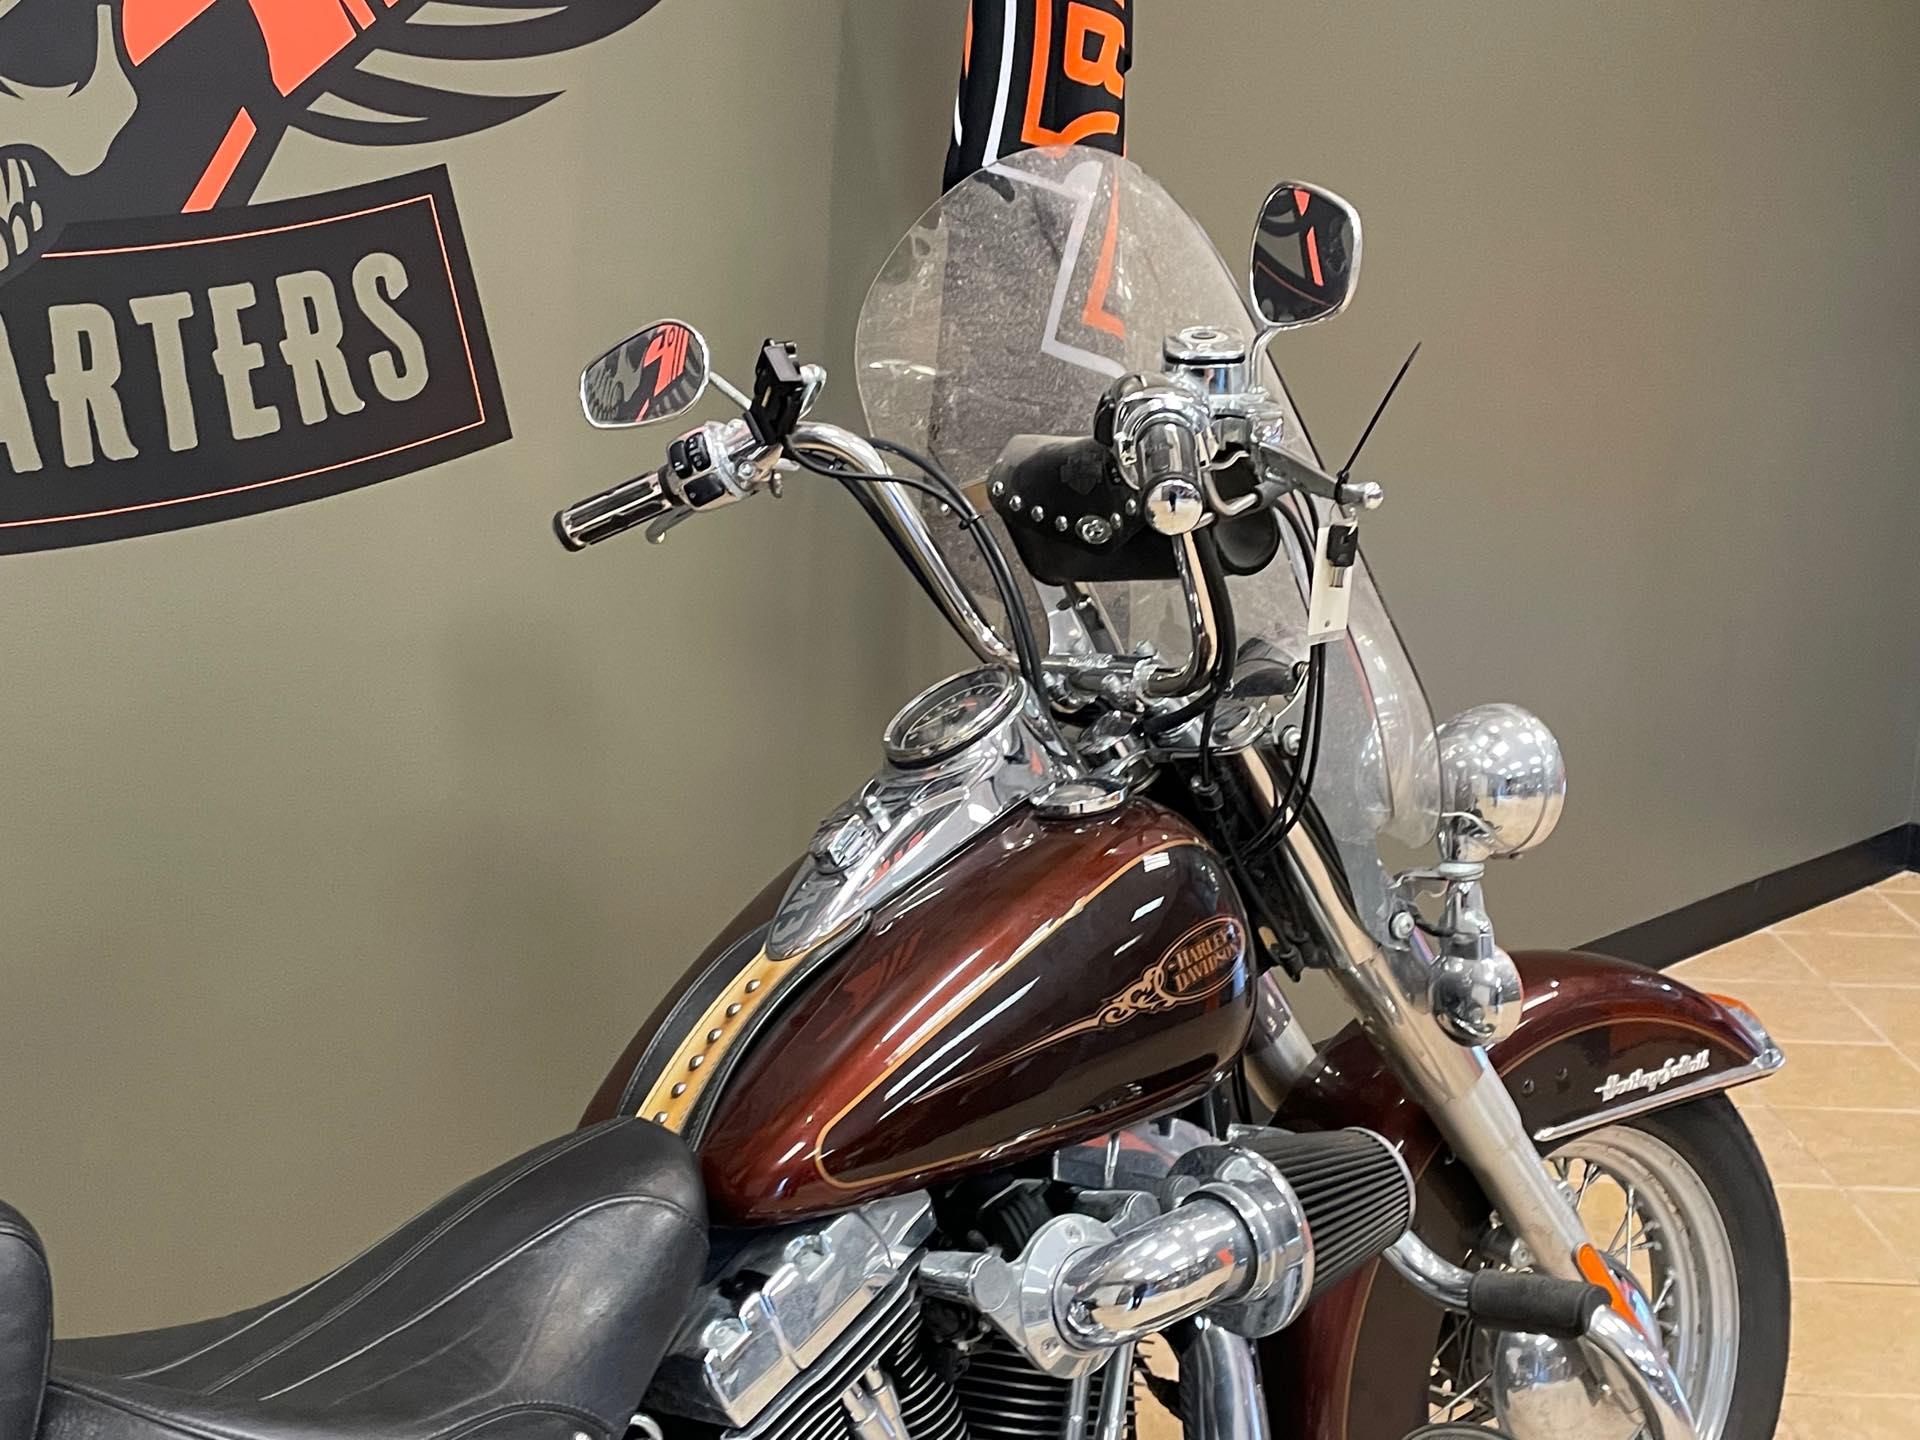 2009 Harley-Davidson Softail Heritage Softail Classic at Loess Hills Harley-Davidson